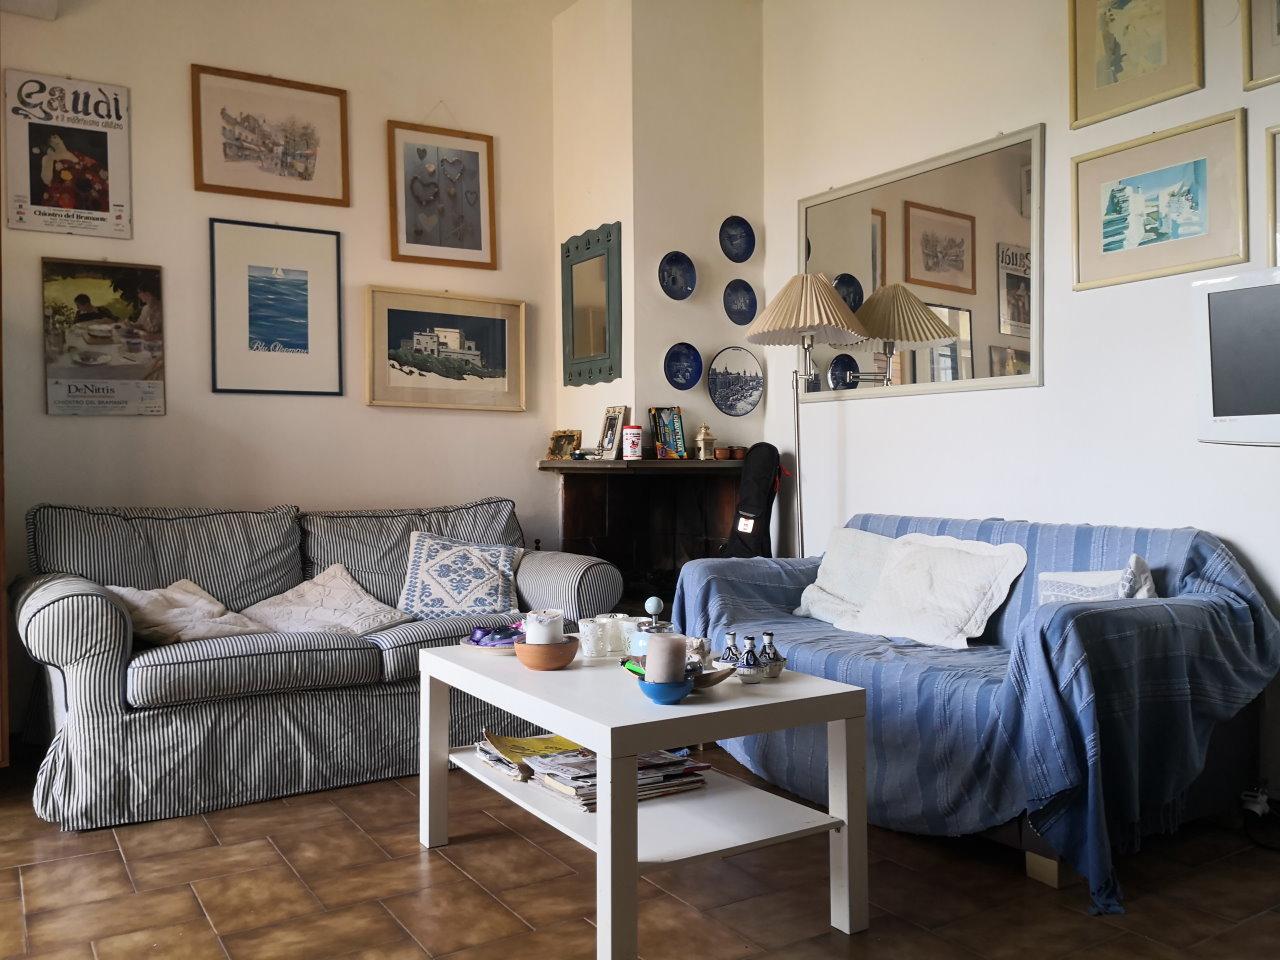 Ap07 – Appartamento a schiera